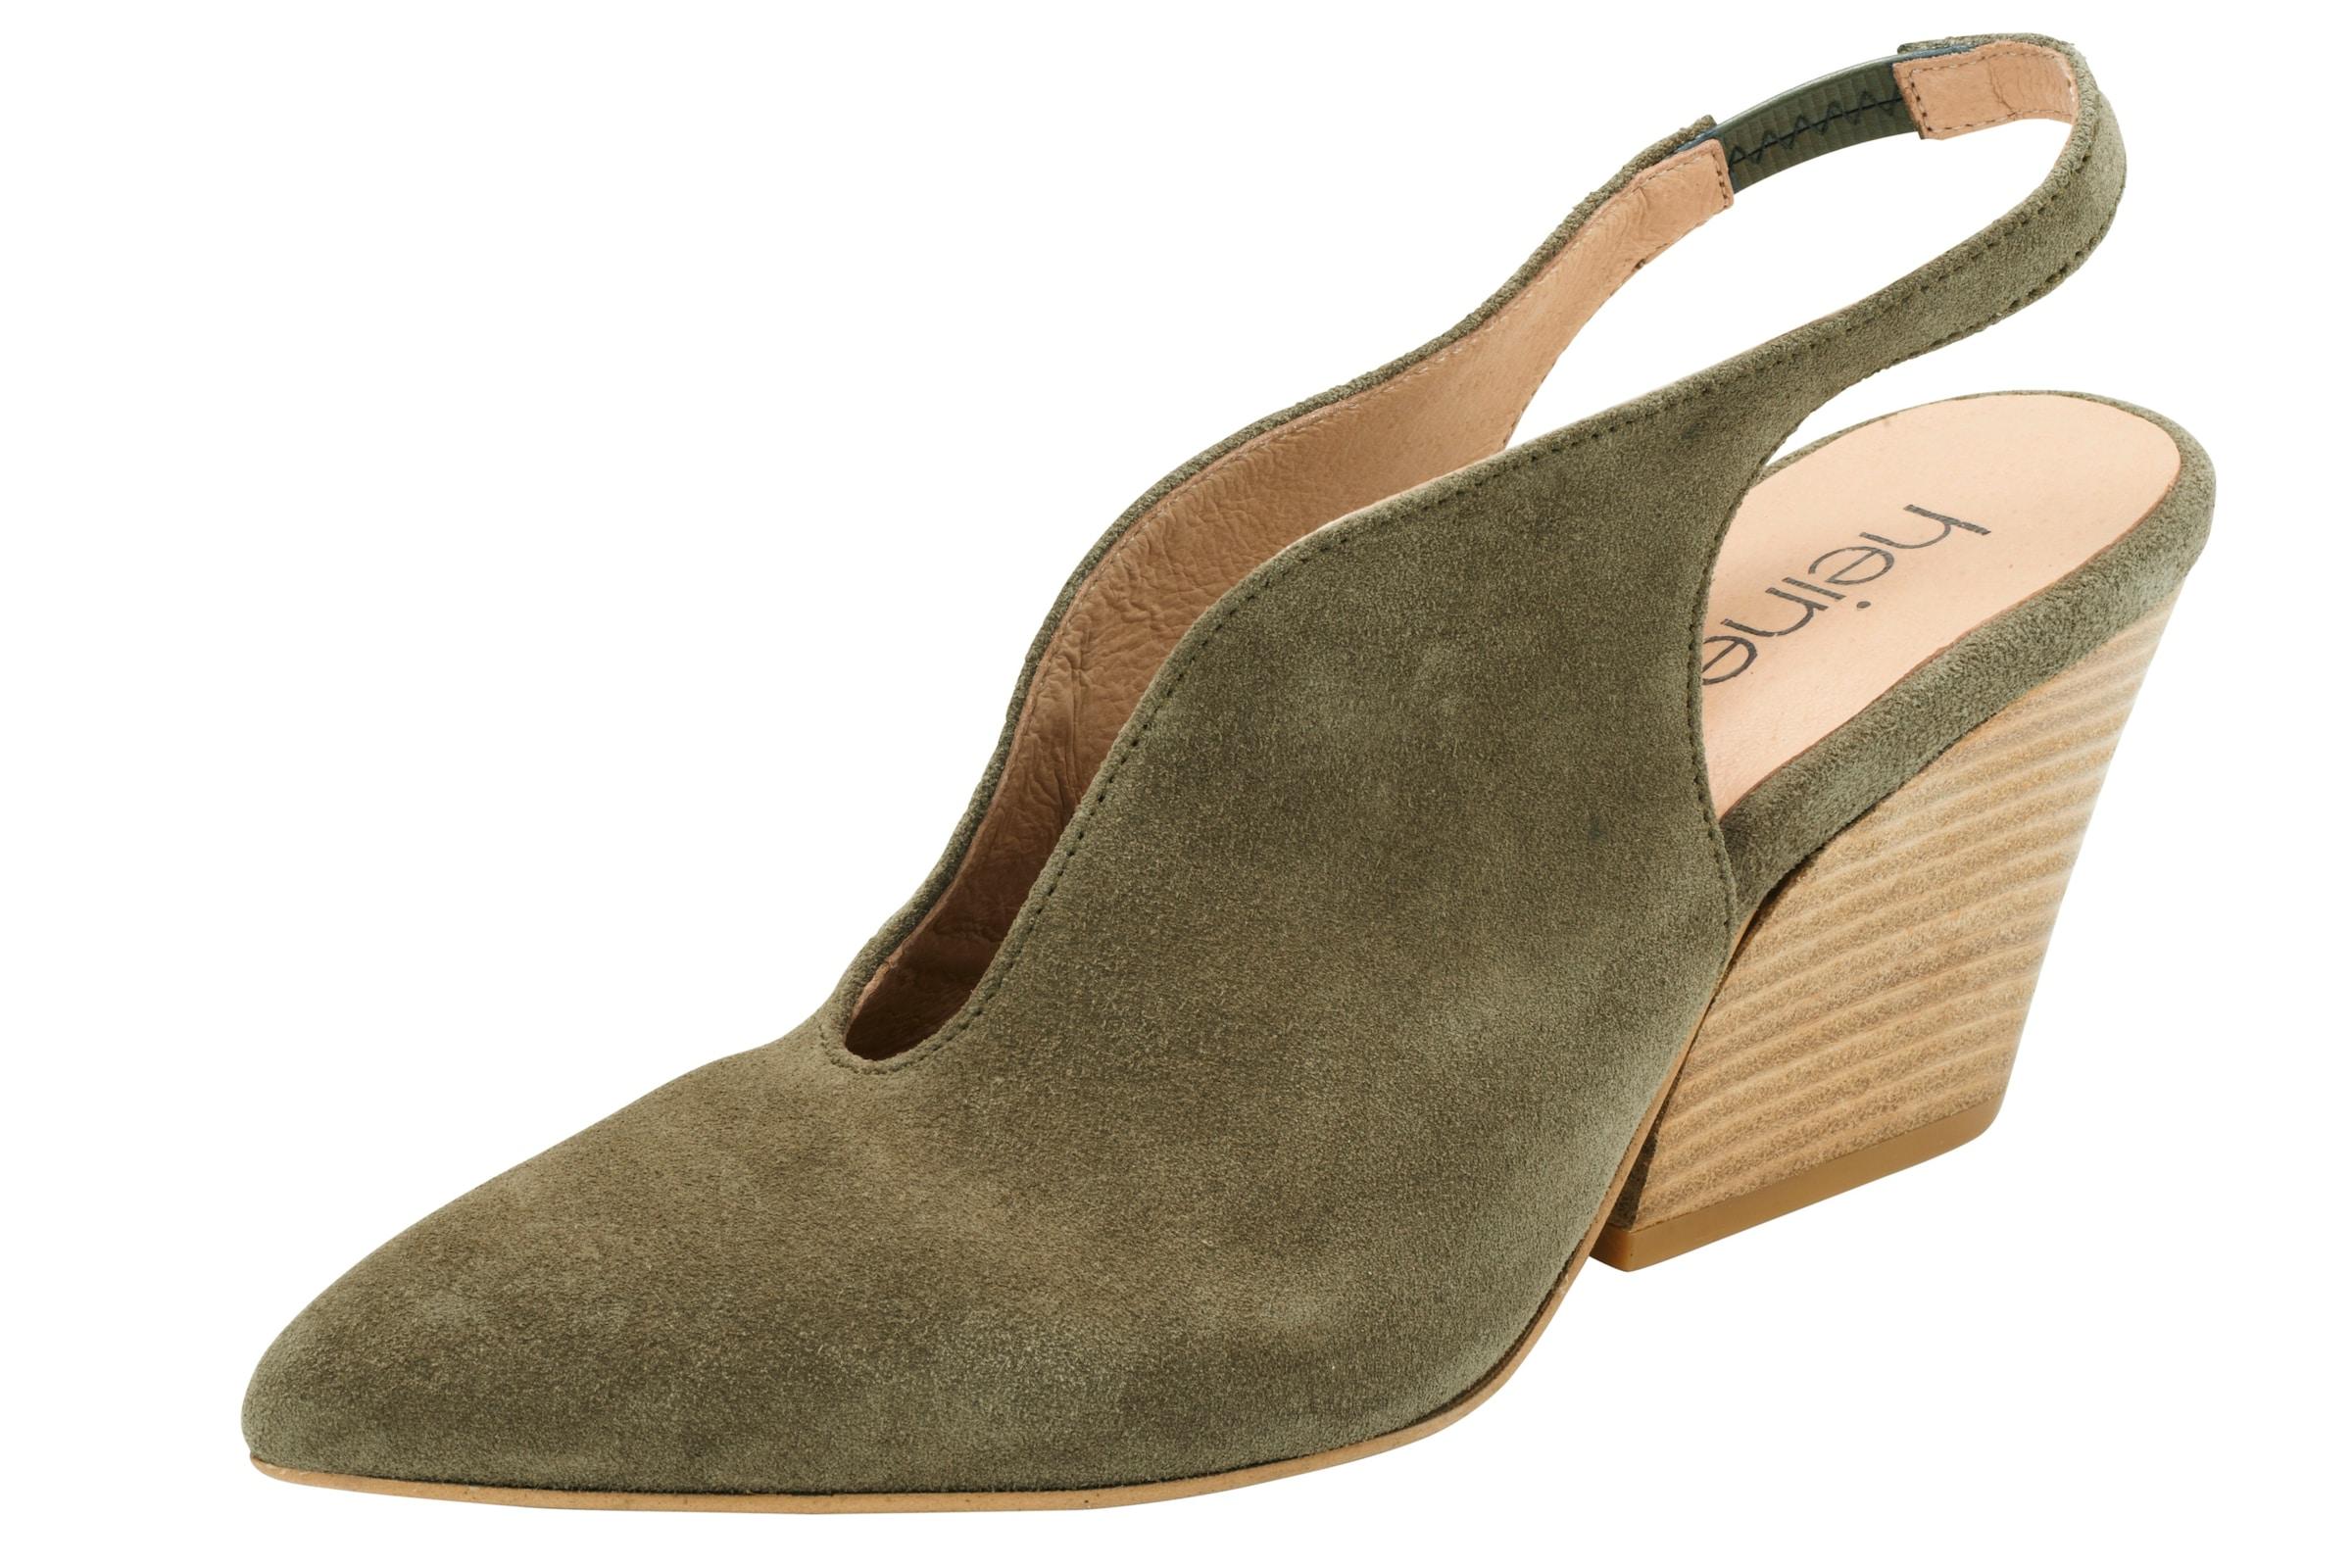 Haltbare Mode billige Schuhe heine | Slingpumps Schuhe Gut getragene Schuhe